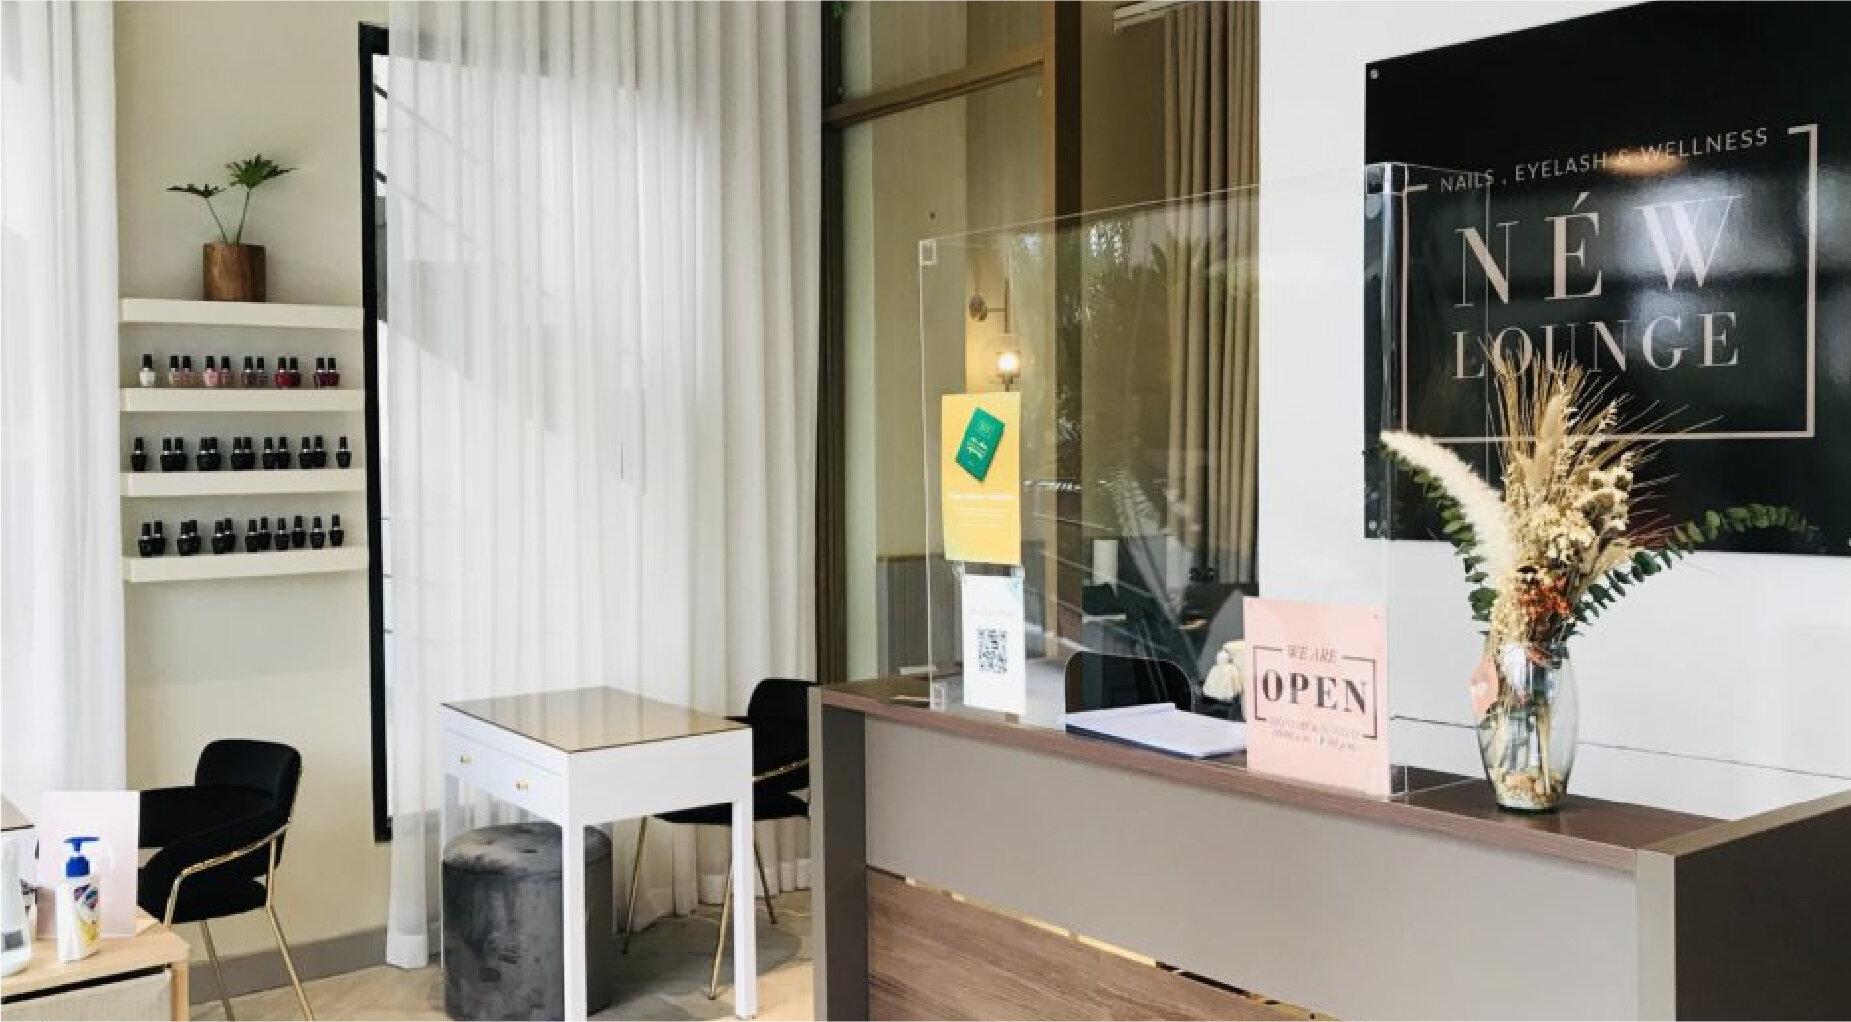 Bat your eyelash in style—NÉW Lounge opens in Angeles, Pampangaby Joann Manabat of Punto! | December 22, 2020